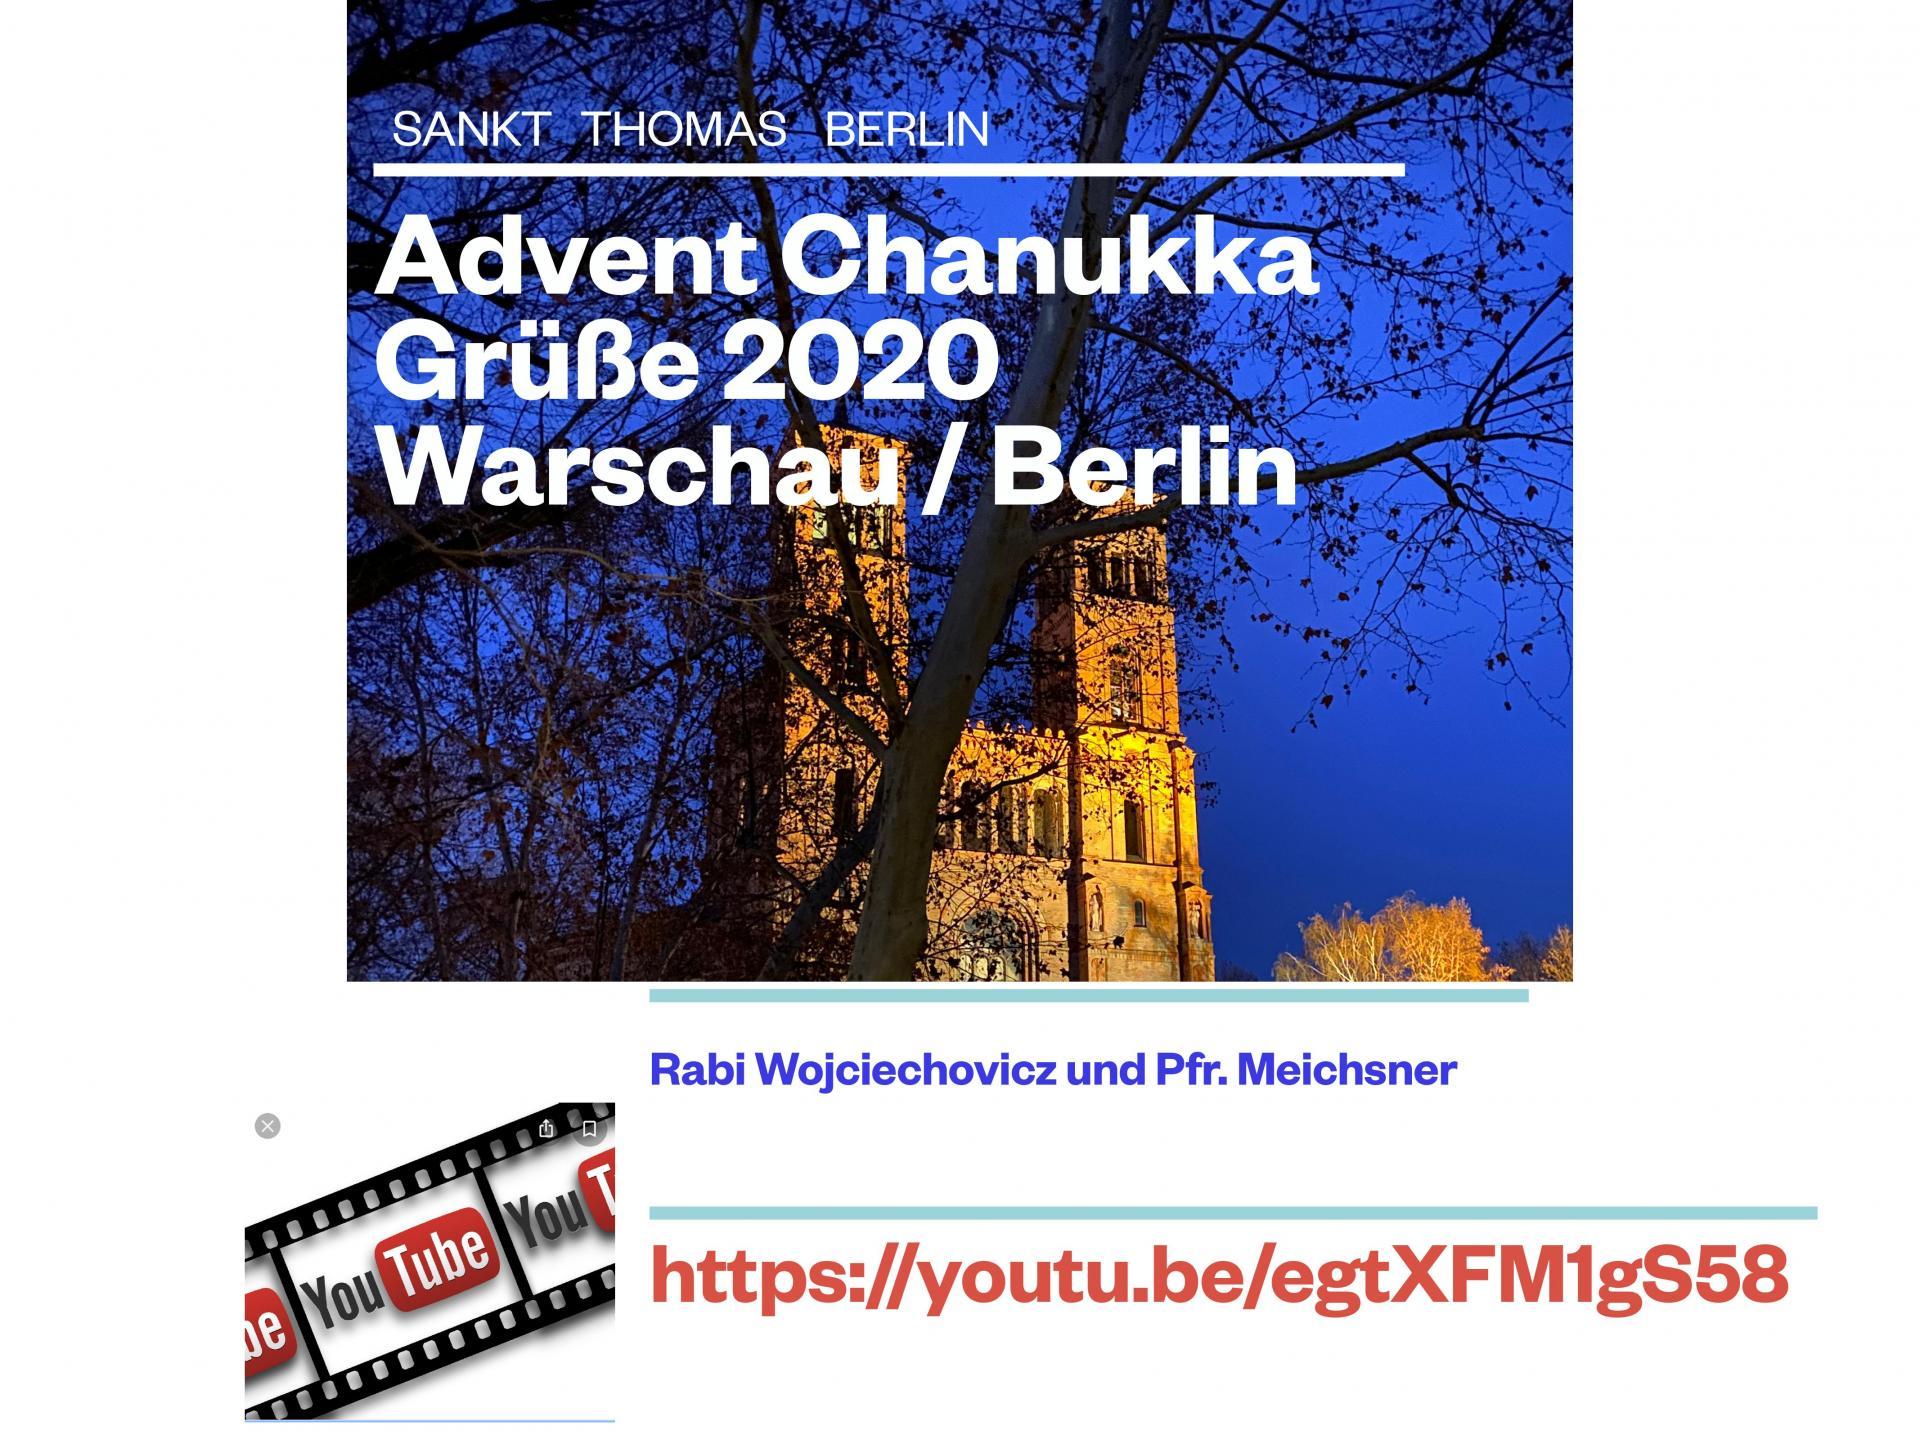 2021-03-11-chanuka-adwent-berlin-warszawa.jpg